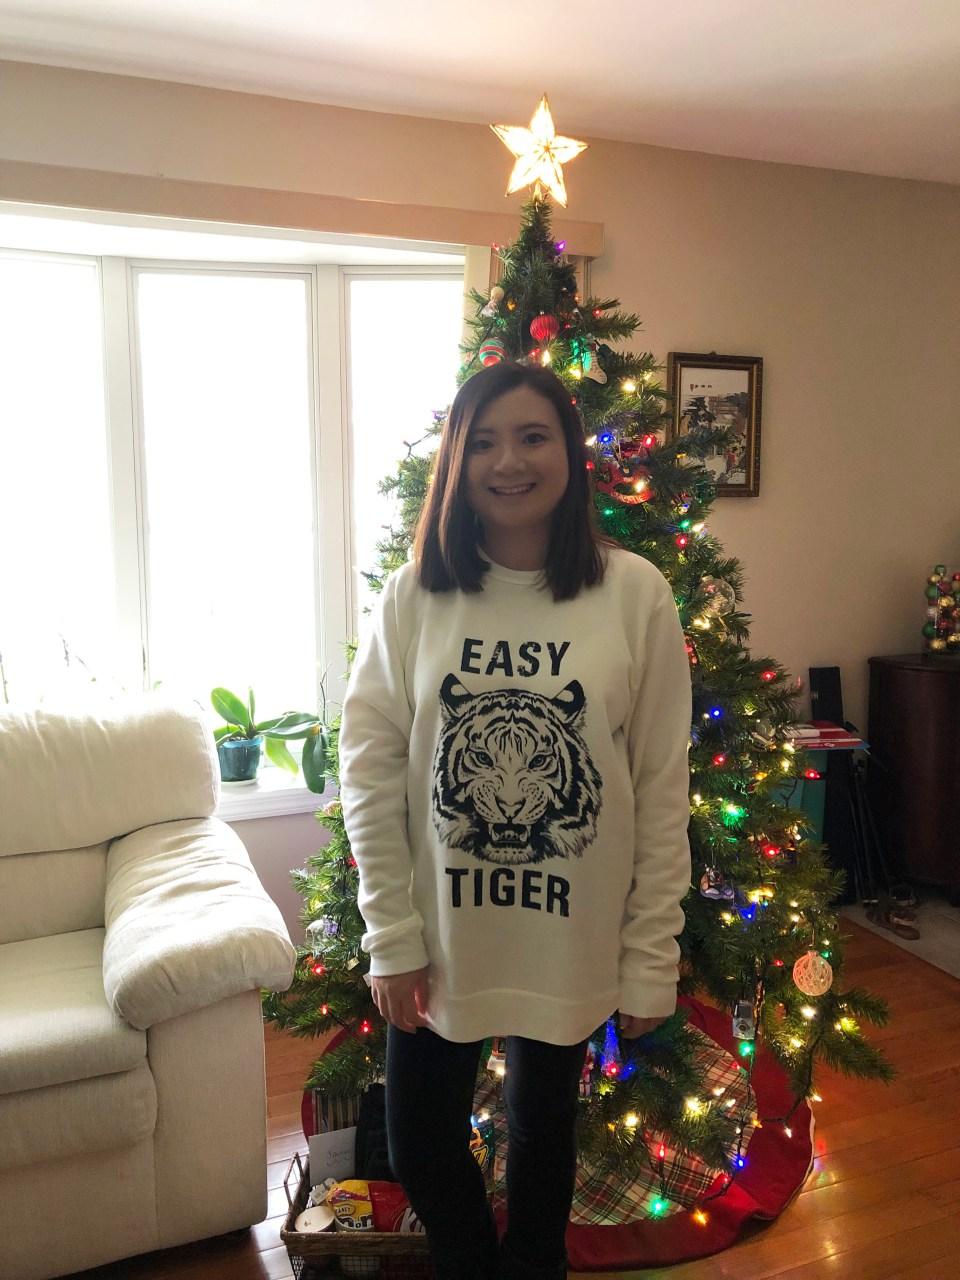 Easy Tiger Sweatshirt 7